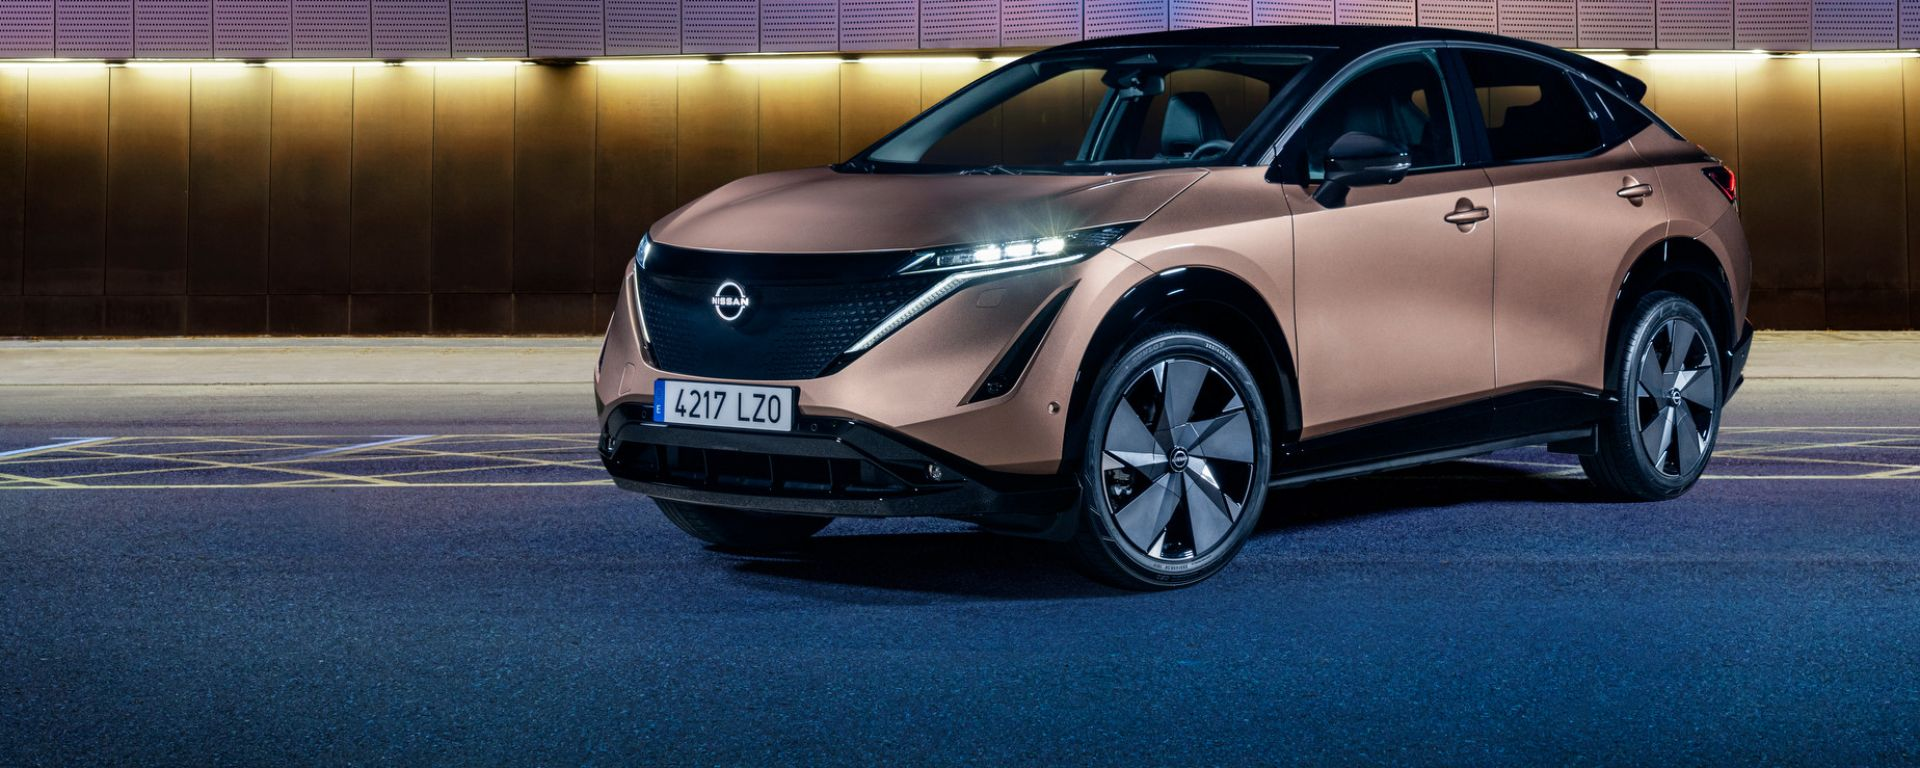 Svelati i colori di nuova Nissan Ariya